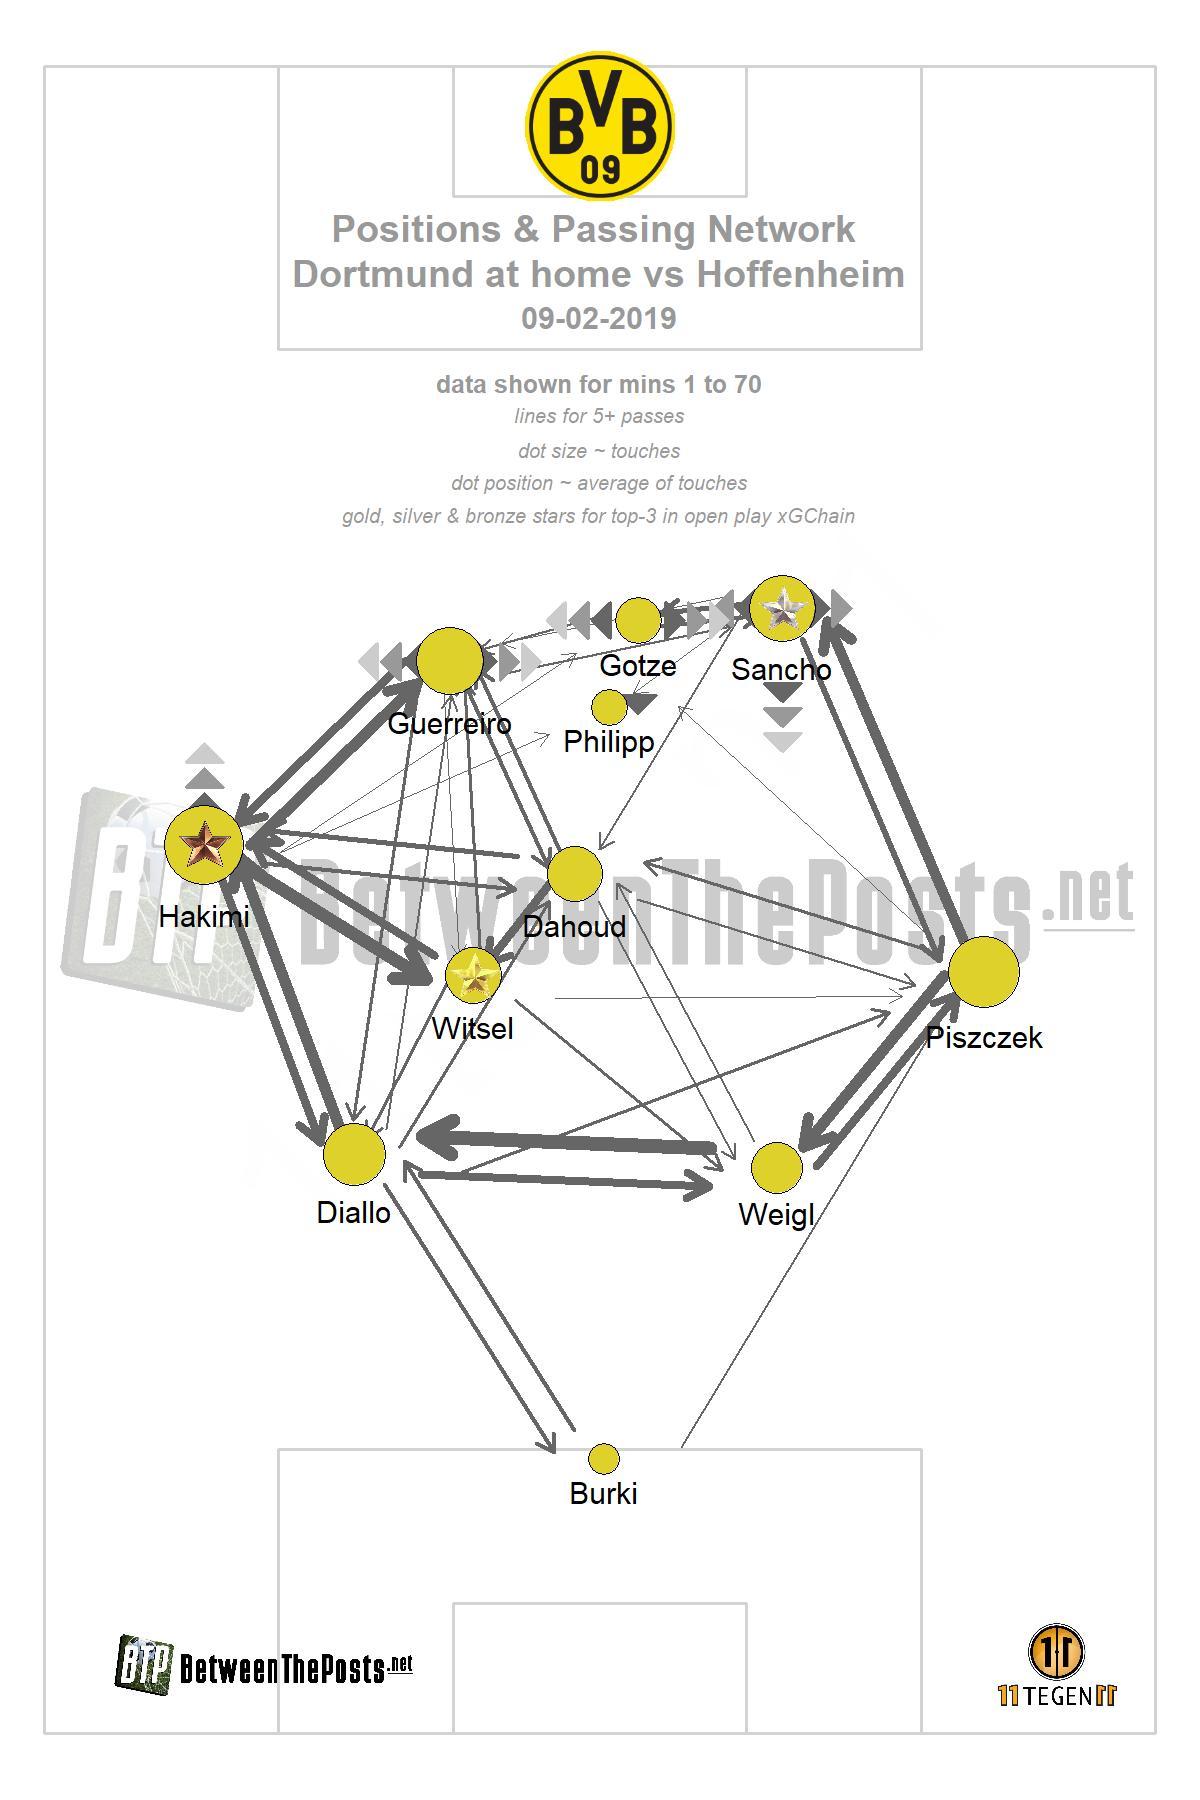 Passmap Borussia Dortmund - TSG Hoffenheim 3-3 Bundesliga